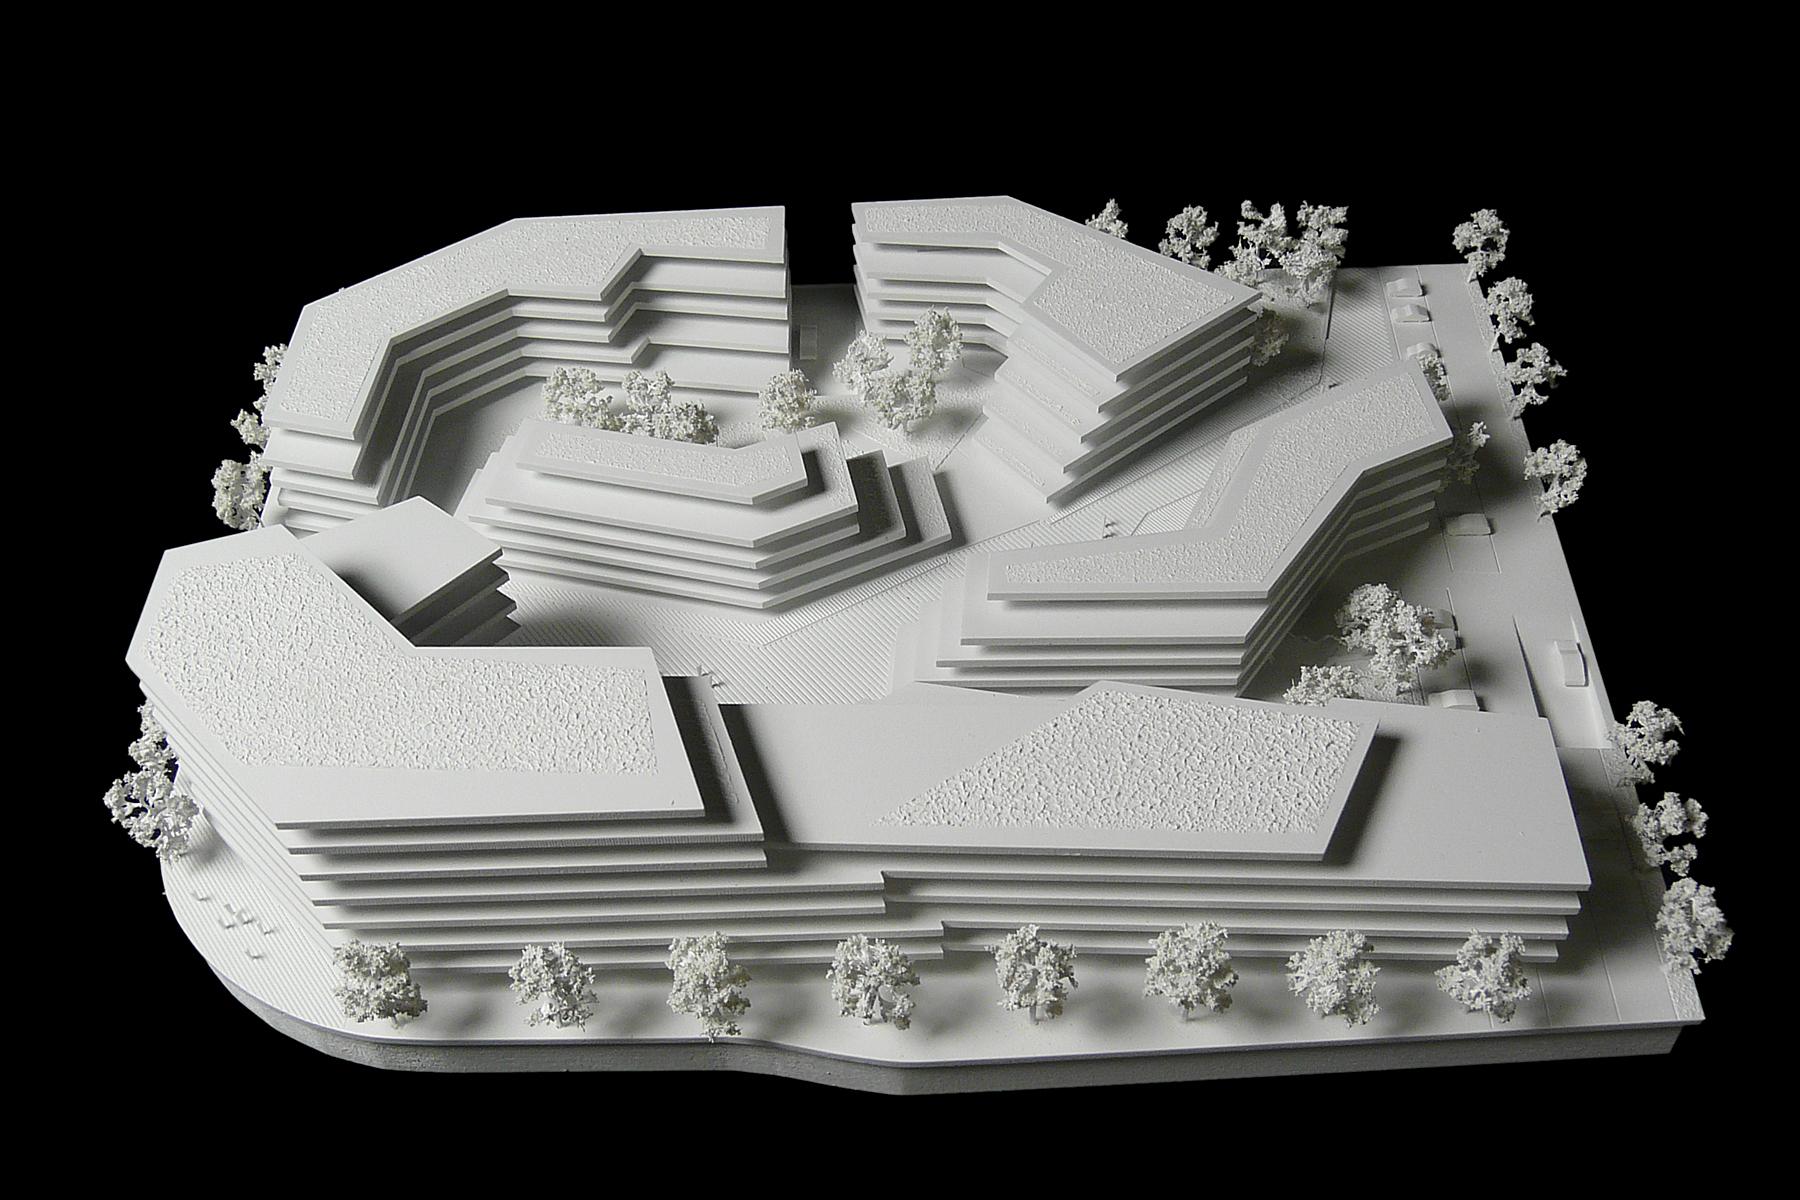 architekturmodell hauptsitz gag k ln b la berec. Black Bedroom Furniture Sets. Home Design Ideas